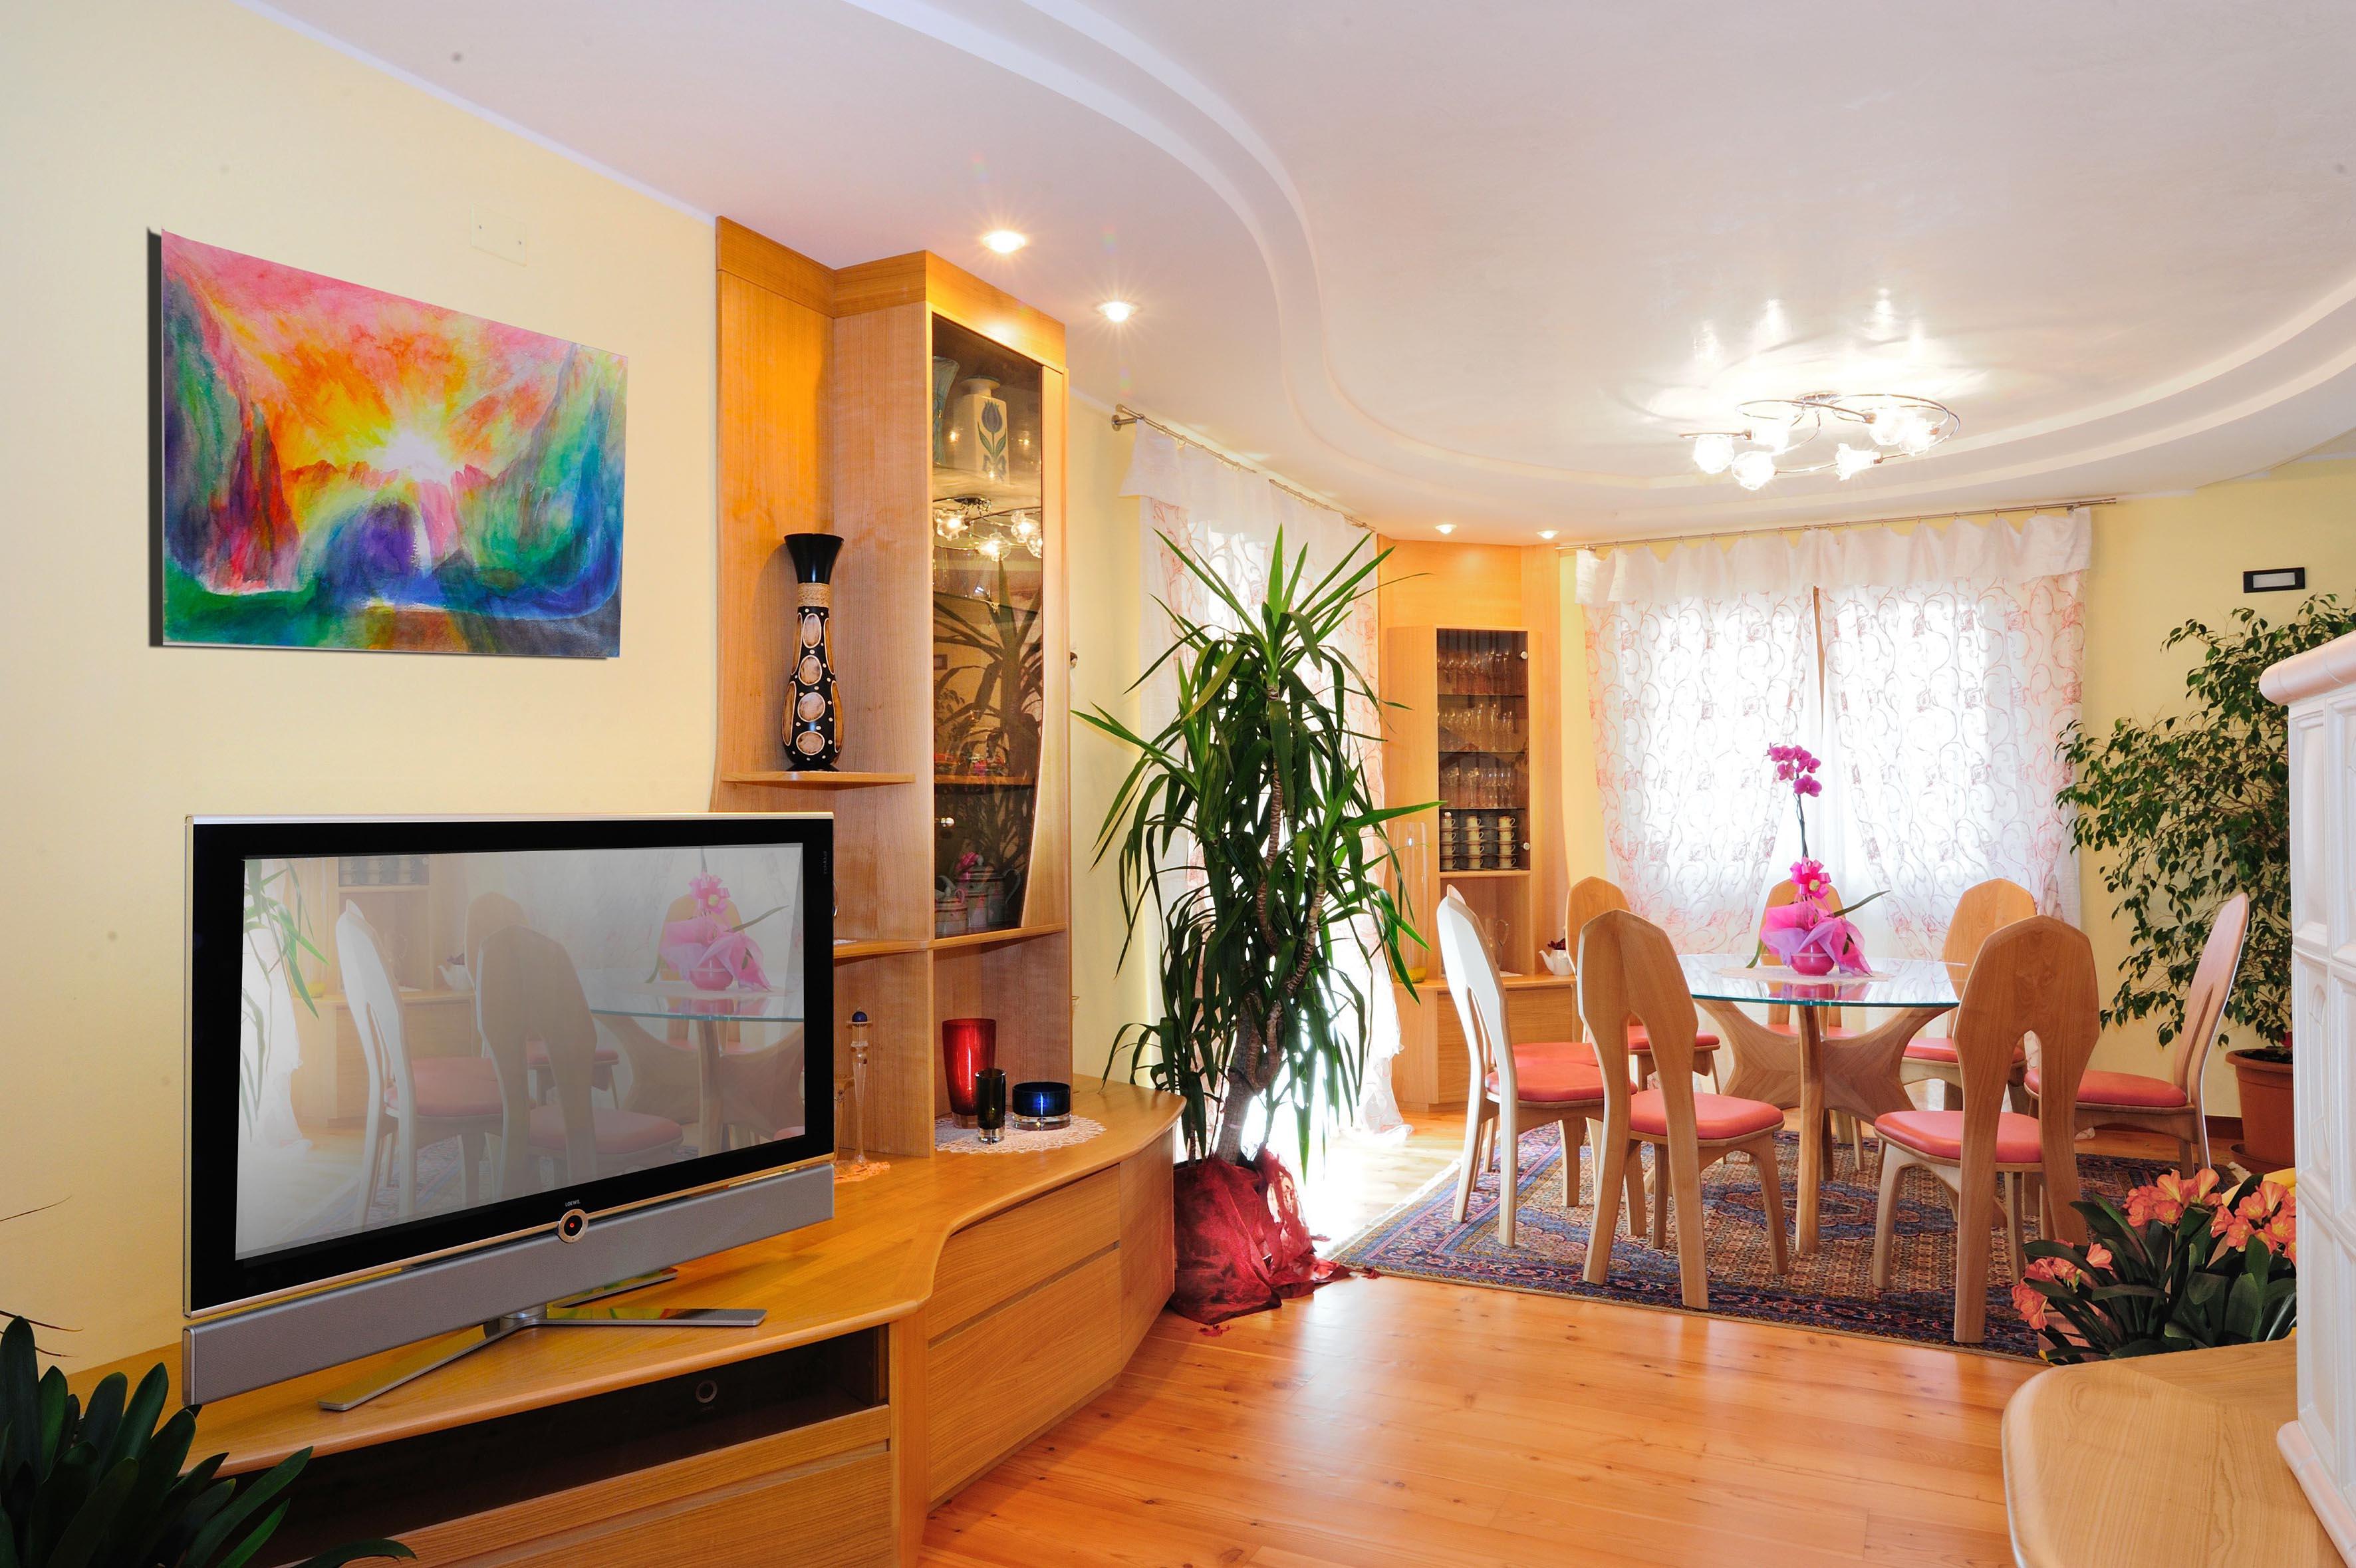 wohnen mit holz bringt lebensqualit t bauen s dtirol. Black Bedroom Furniture Sets. Home Design Ideas